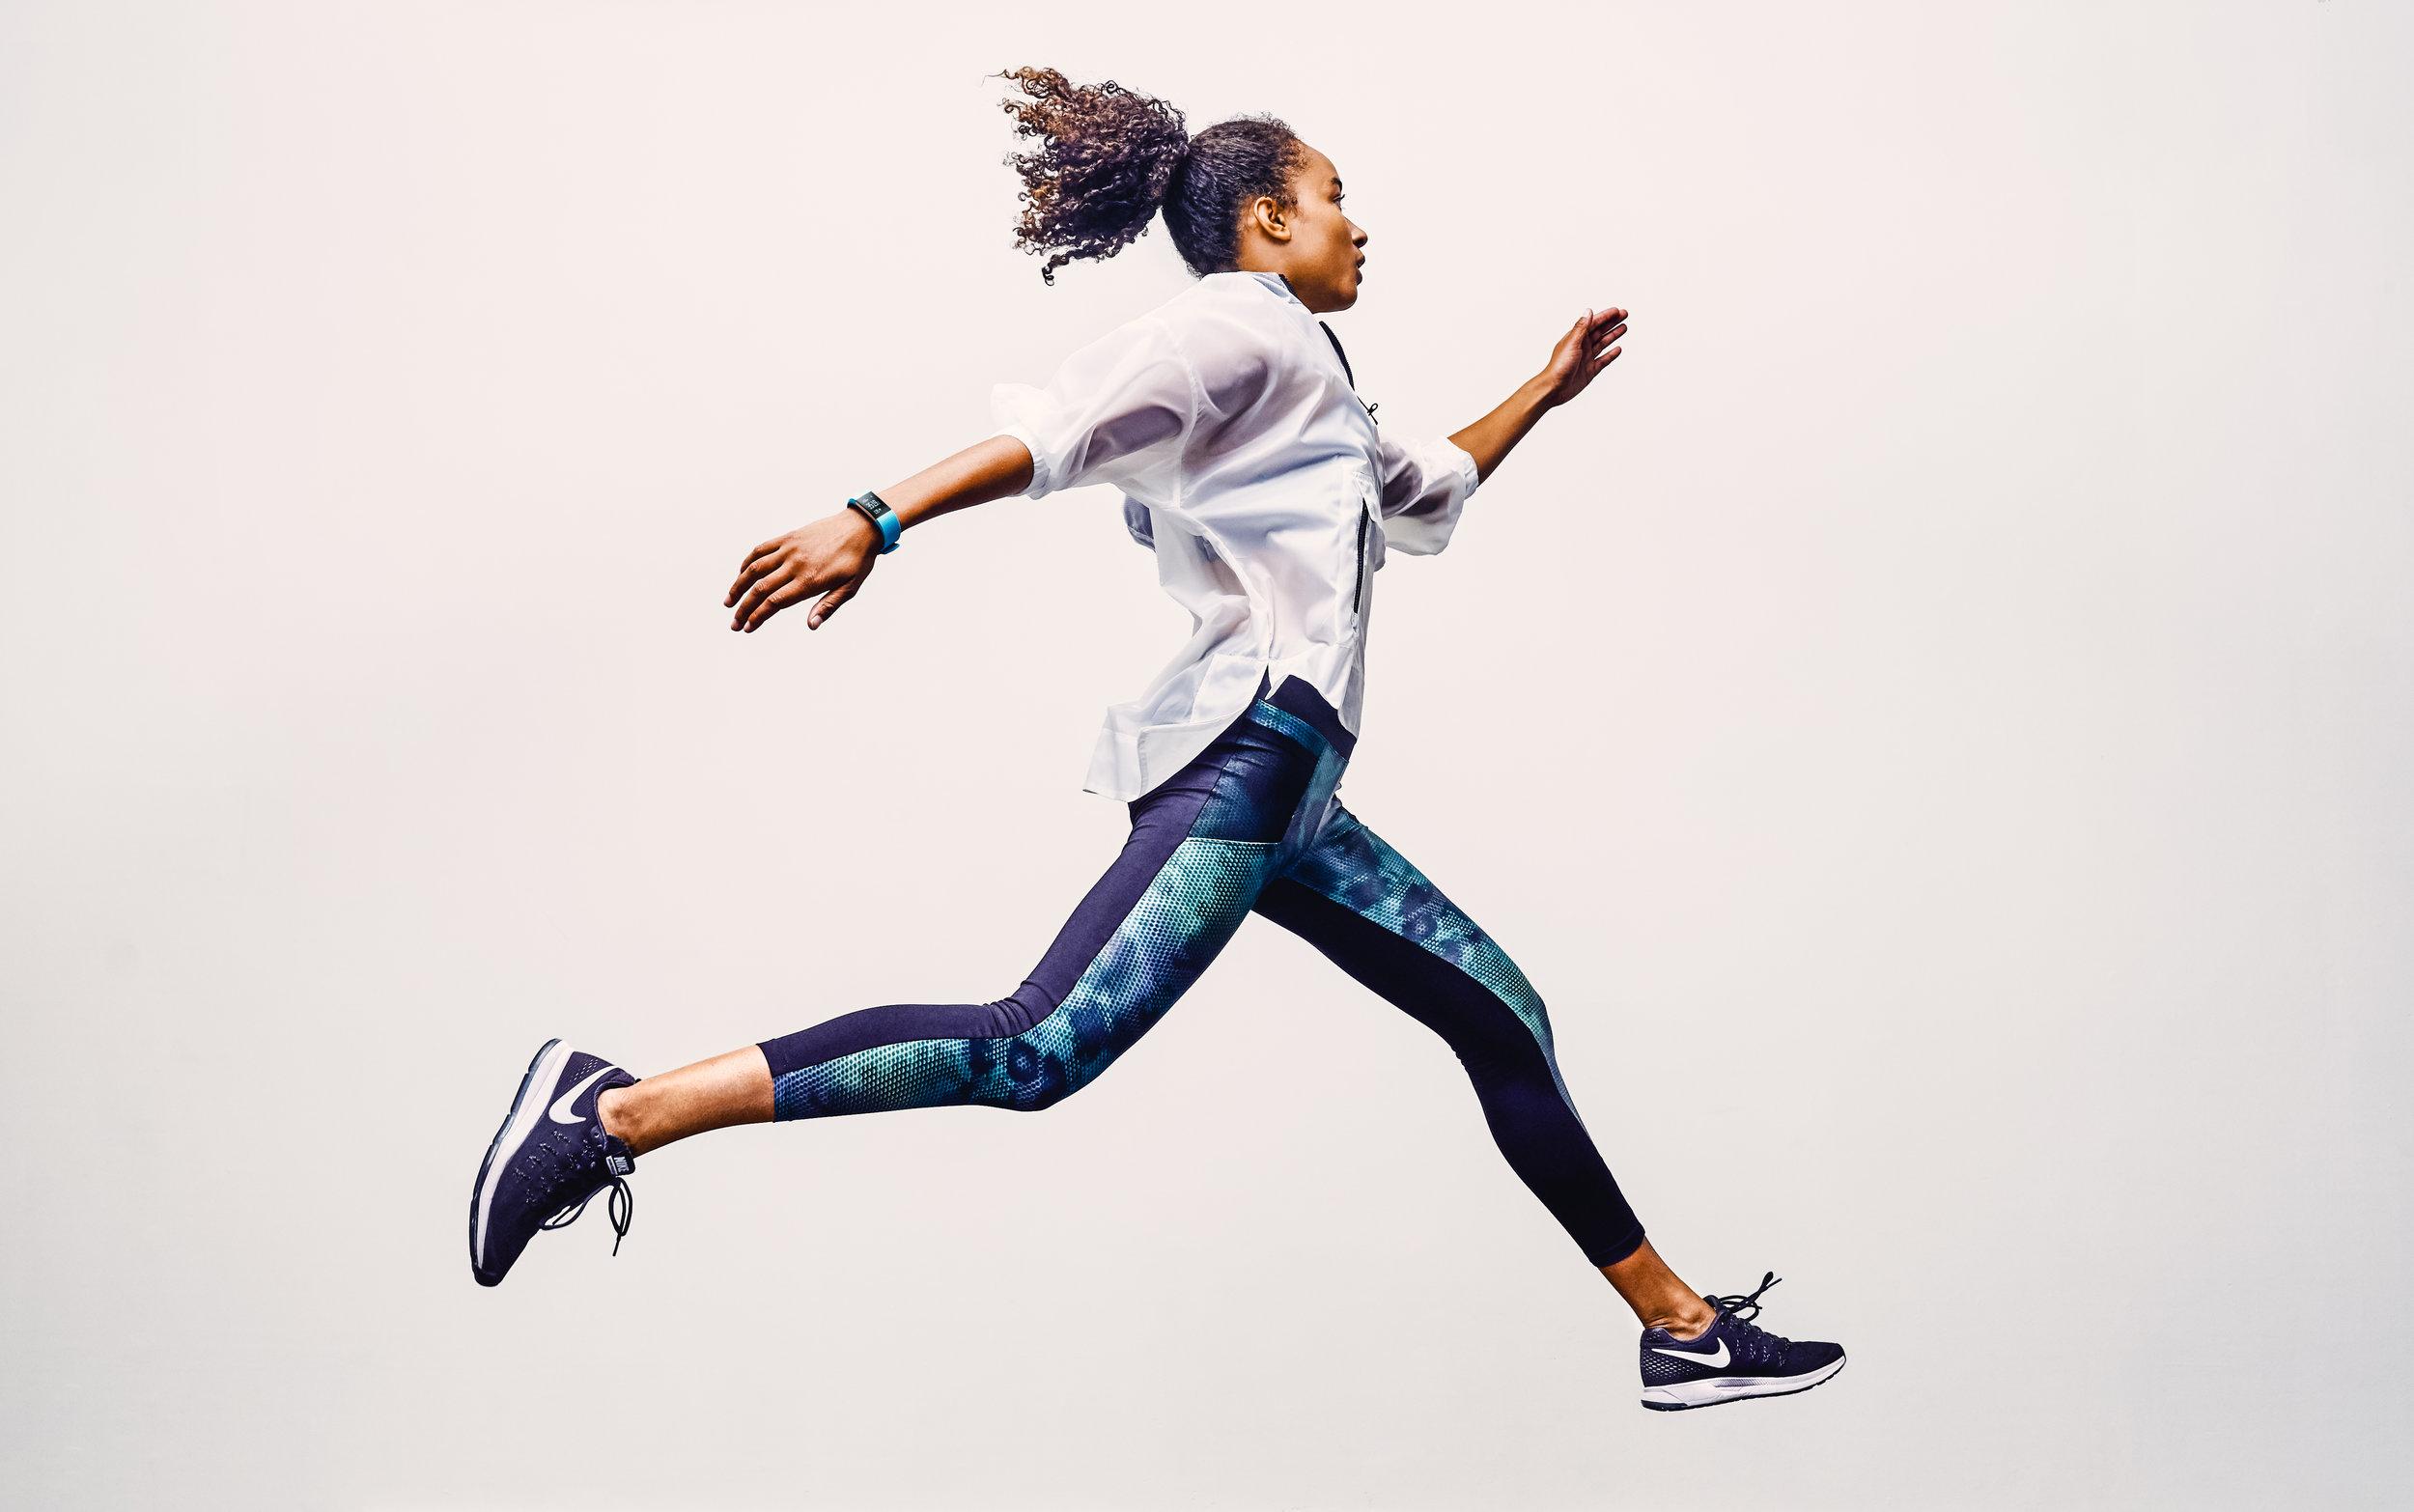 OBJKTV_MaxRes_Fitness_Nike Studio Shoot7547.jpg